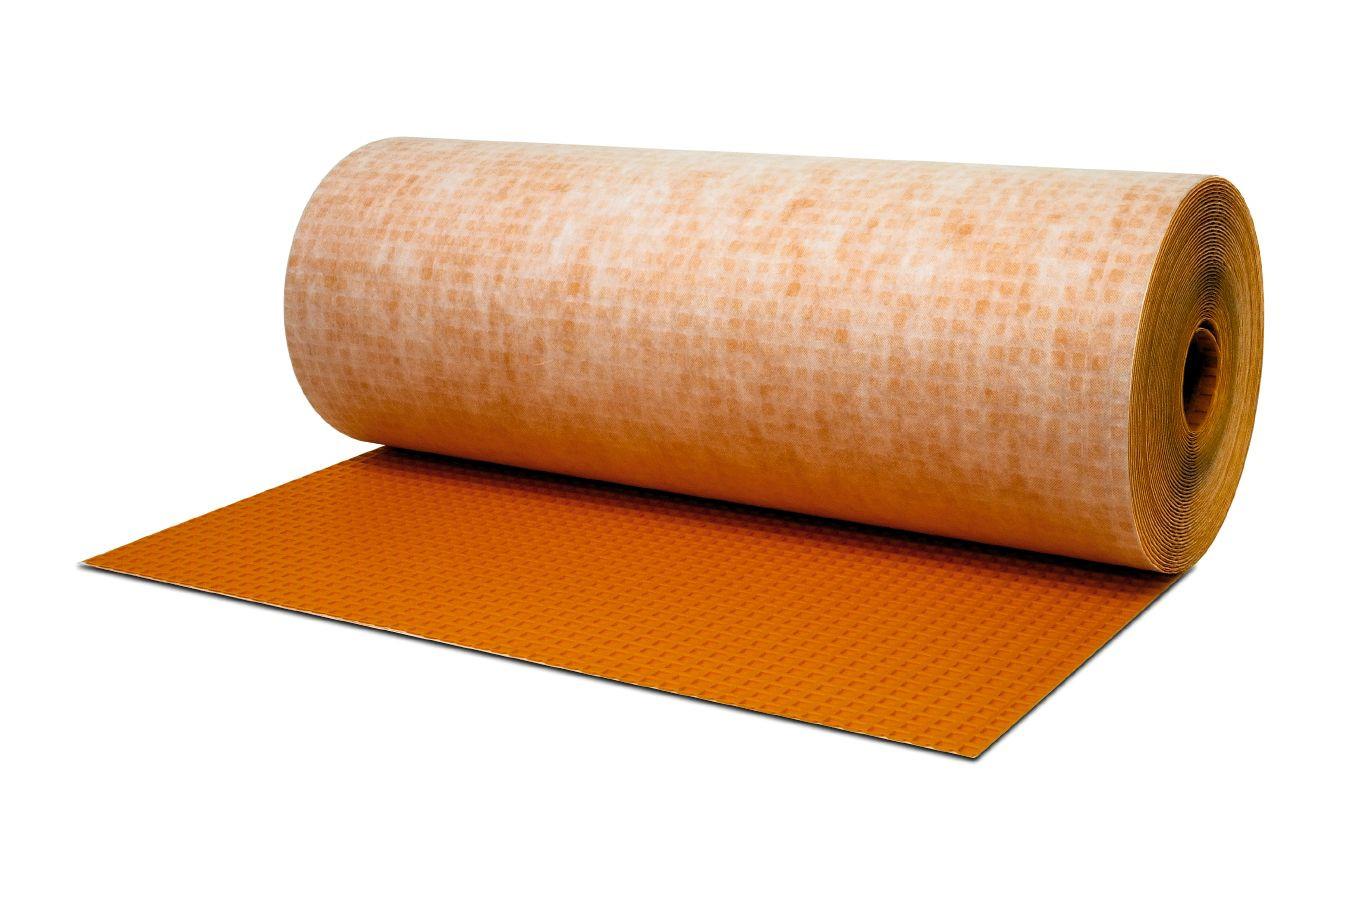 paper underlayment for hardwood floors of schlutera ditra ditra xl uncoupling ditra membranes with regard to schlutera ditra ditra xl